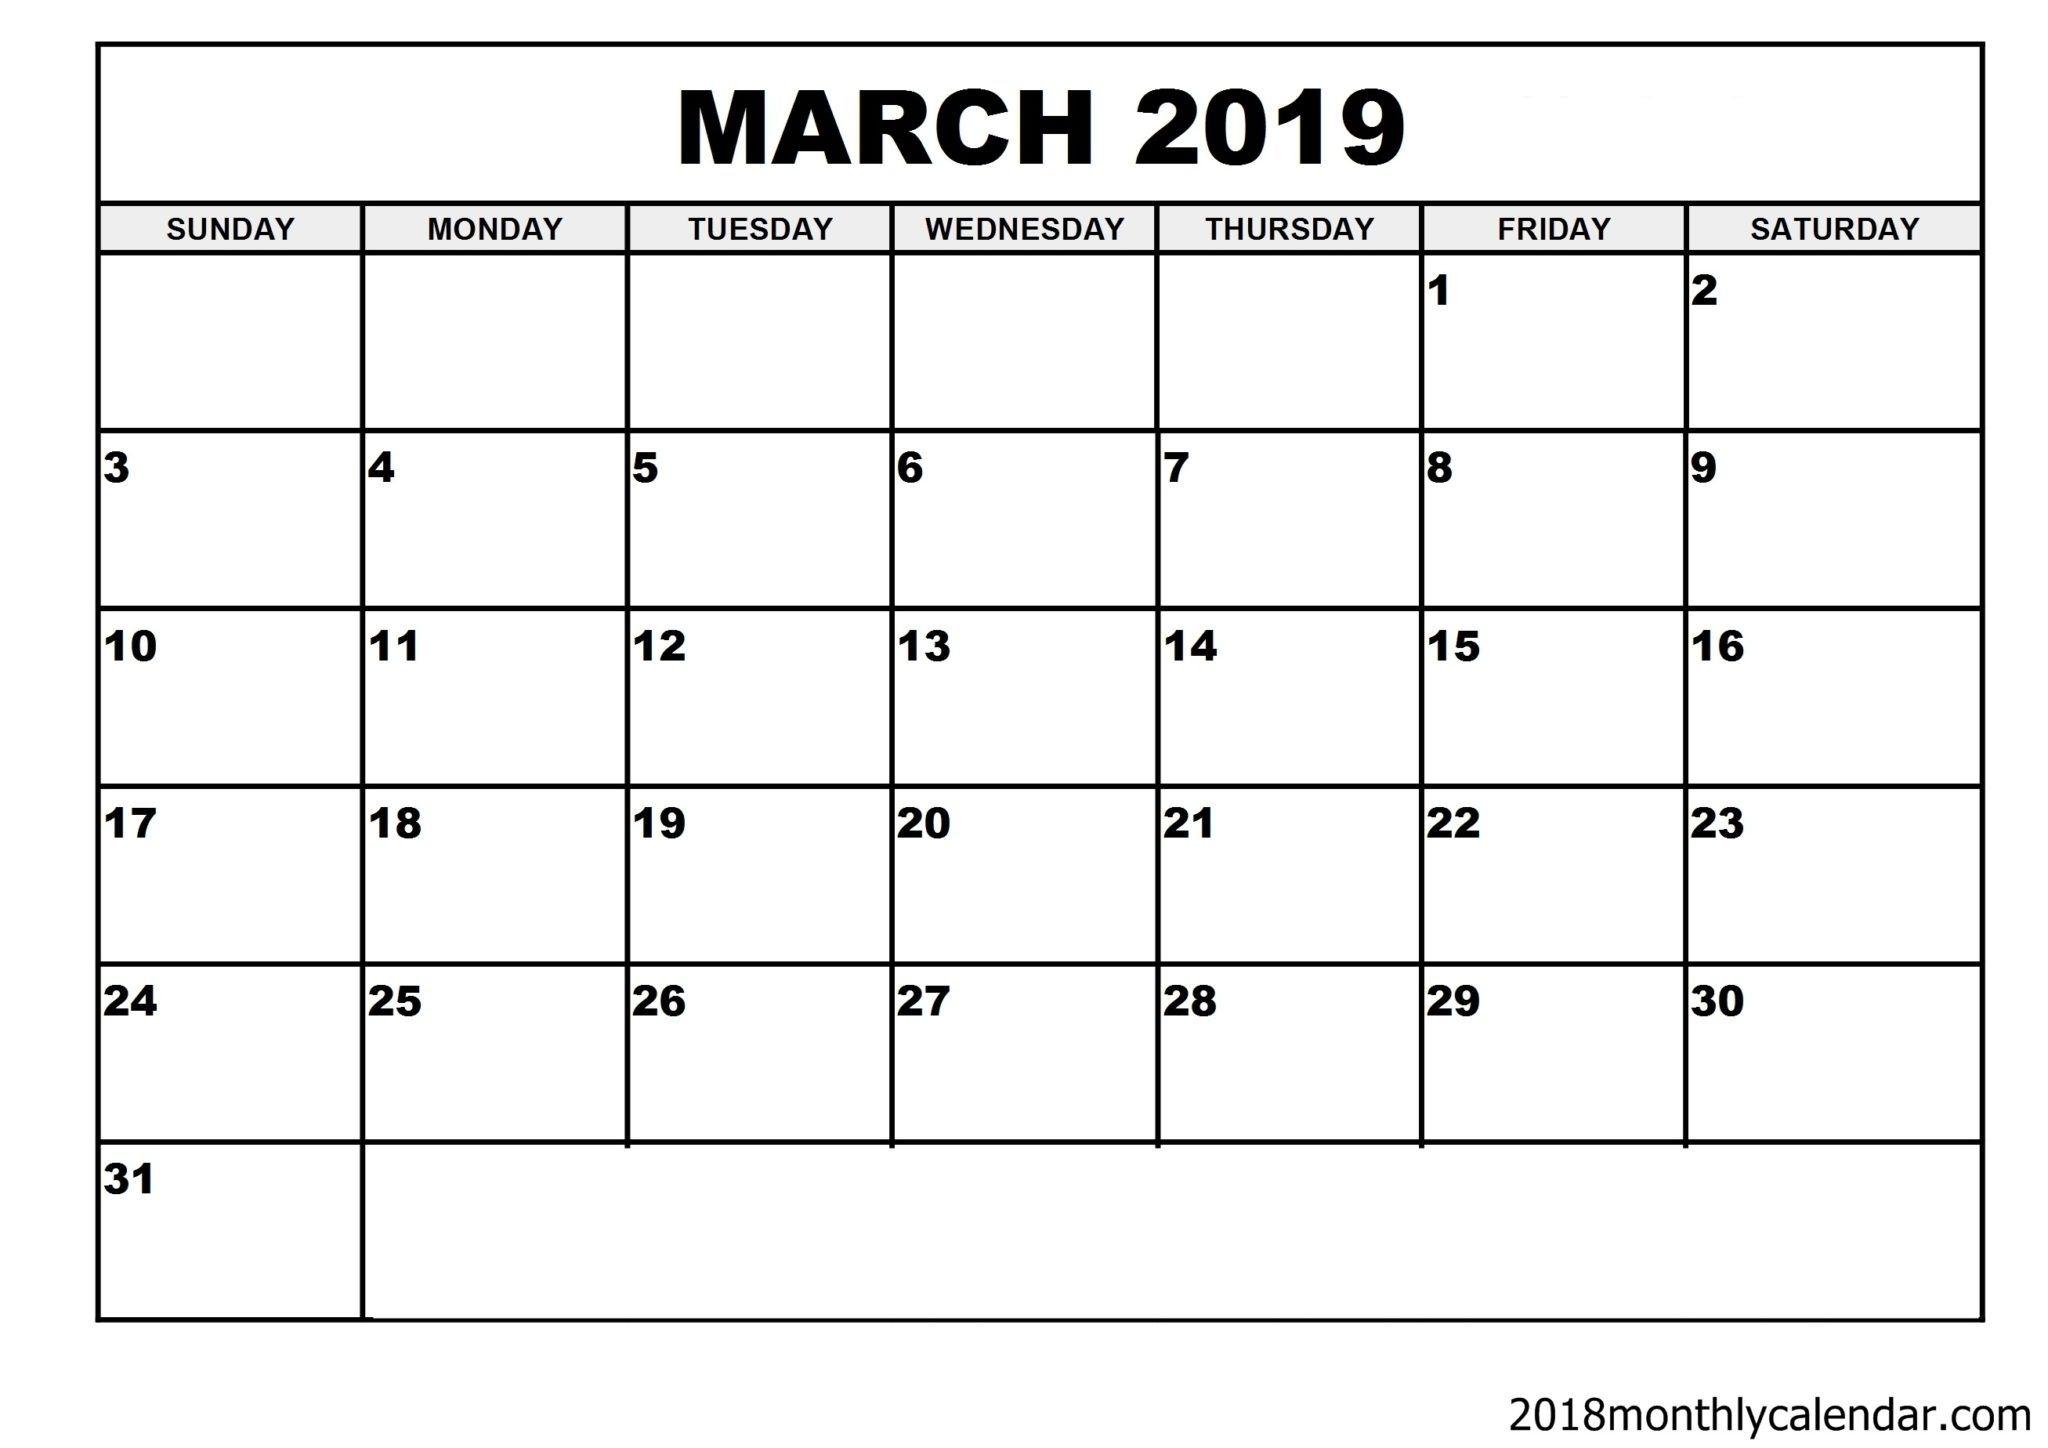 Blank Calendar To Fill In Free - Calendar Inspiration Design for Free Fill In Calendar Template